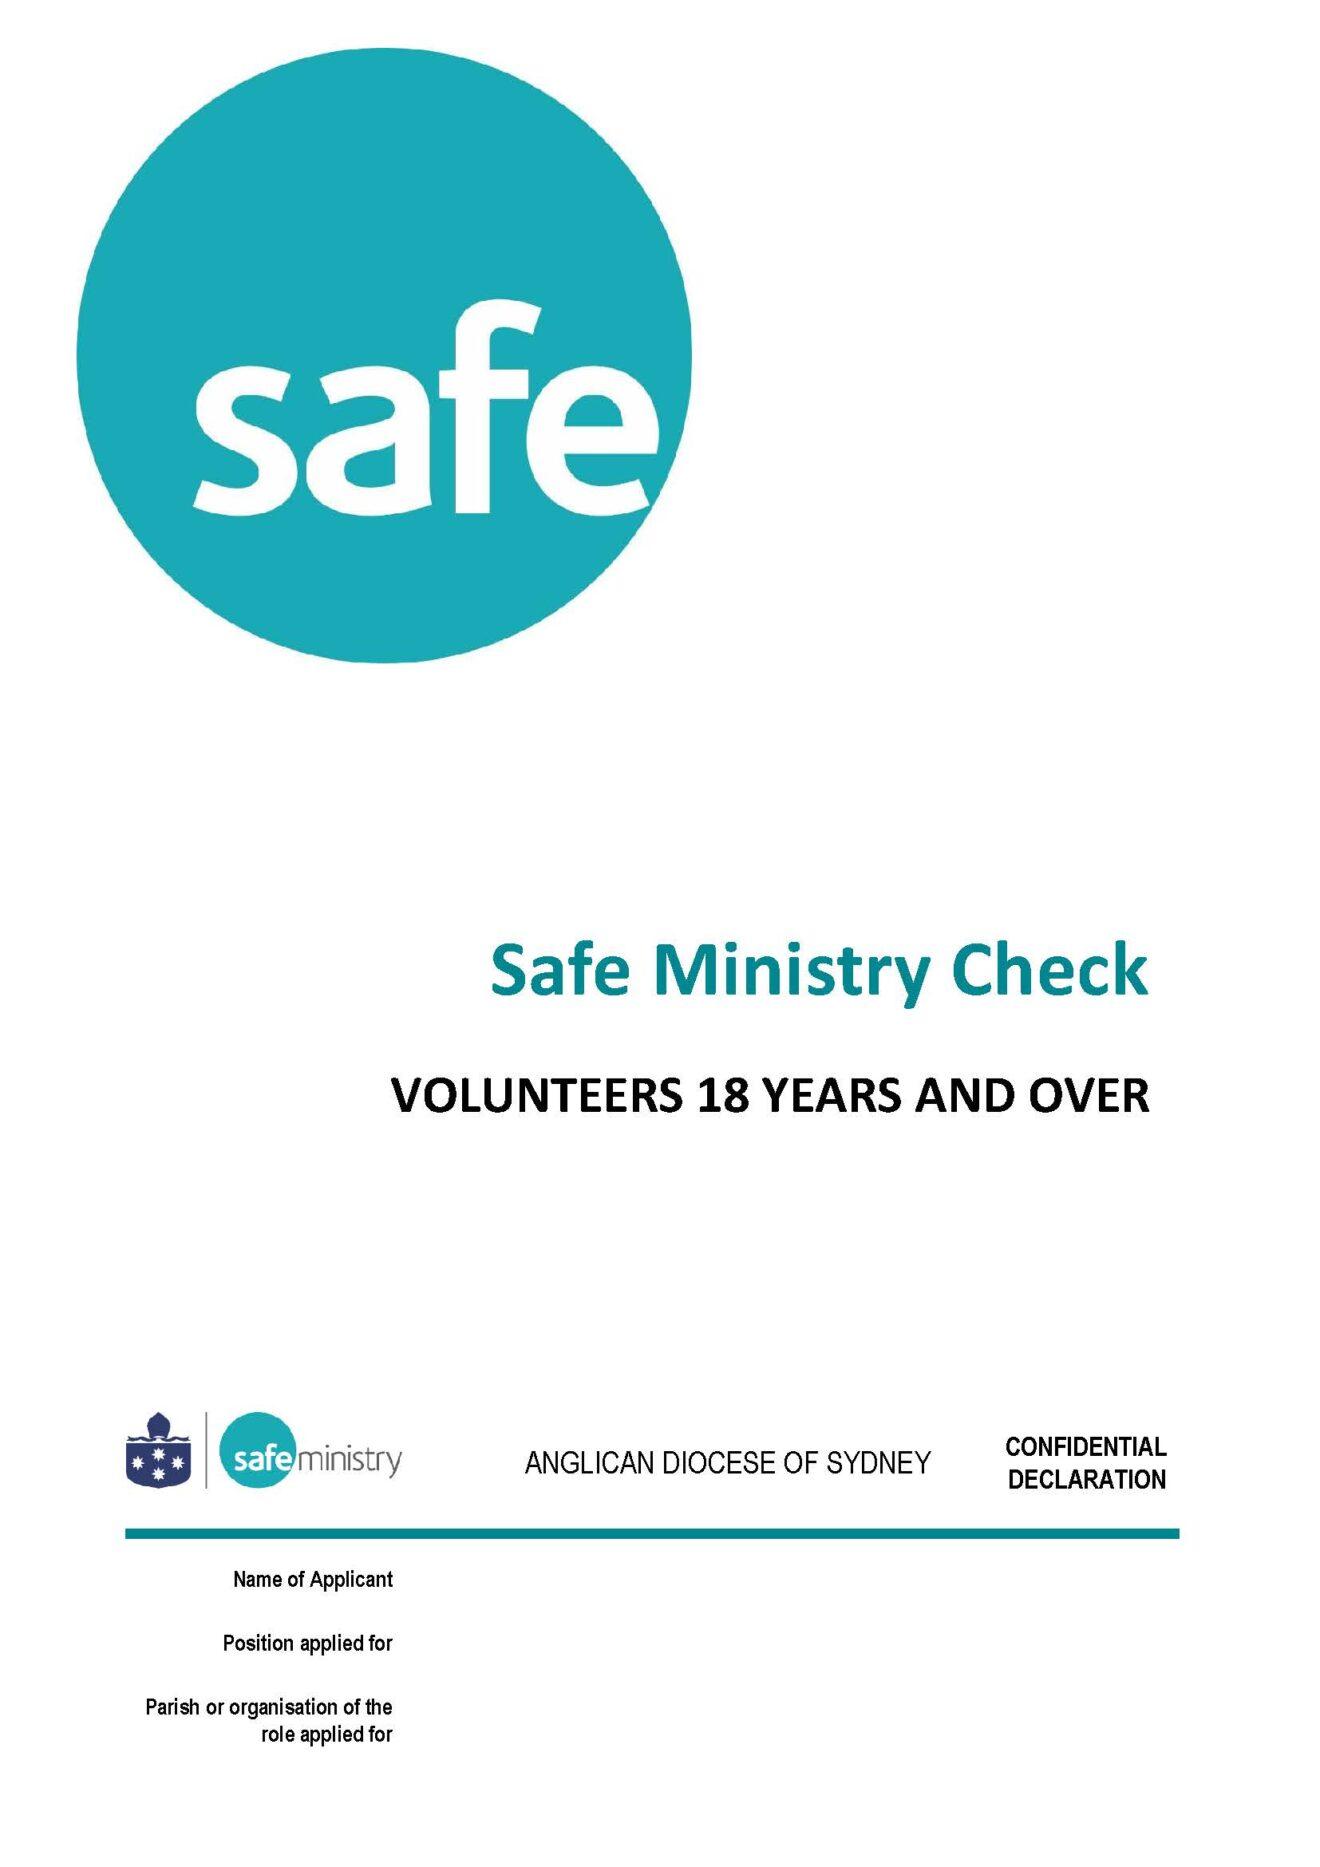 TITLE-SMC-Volunteers-18-years-and-older-200625